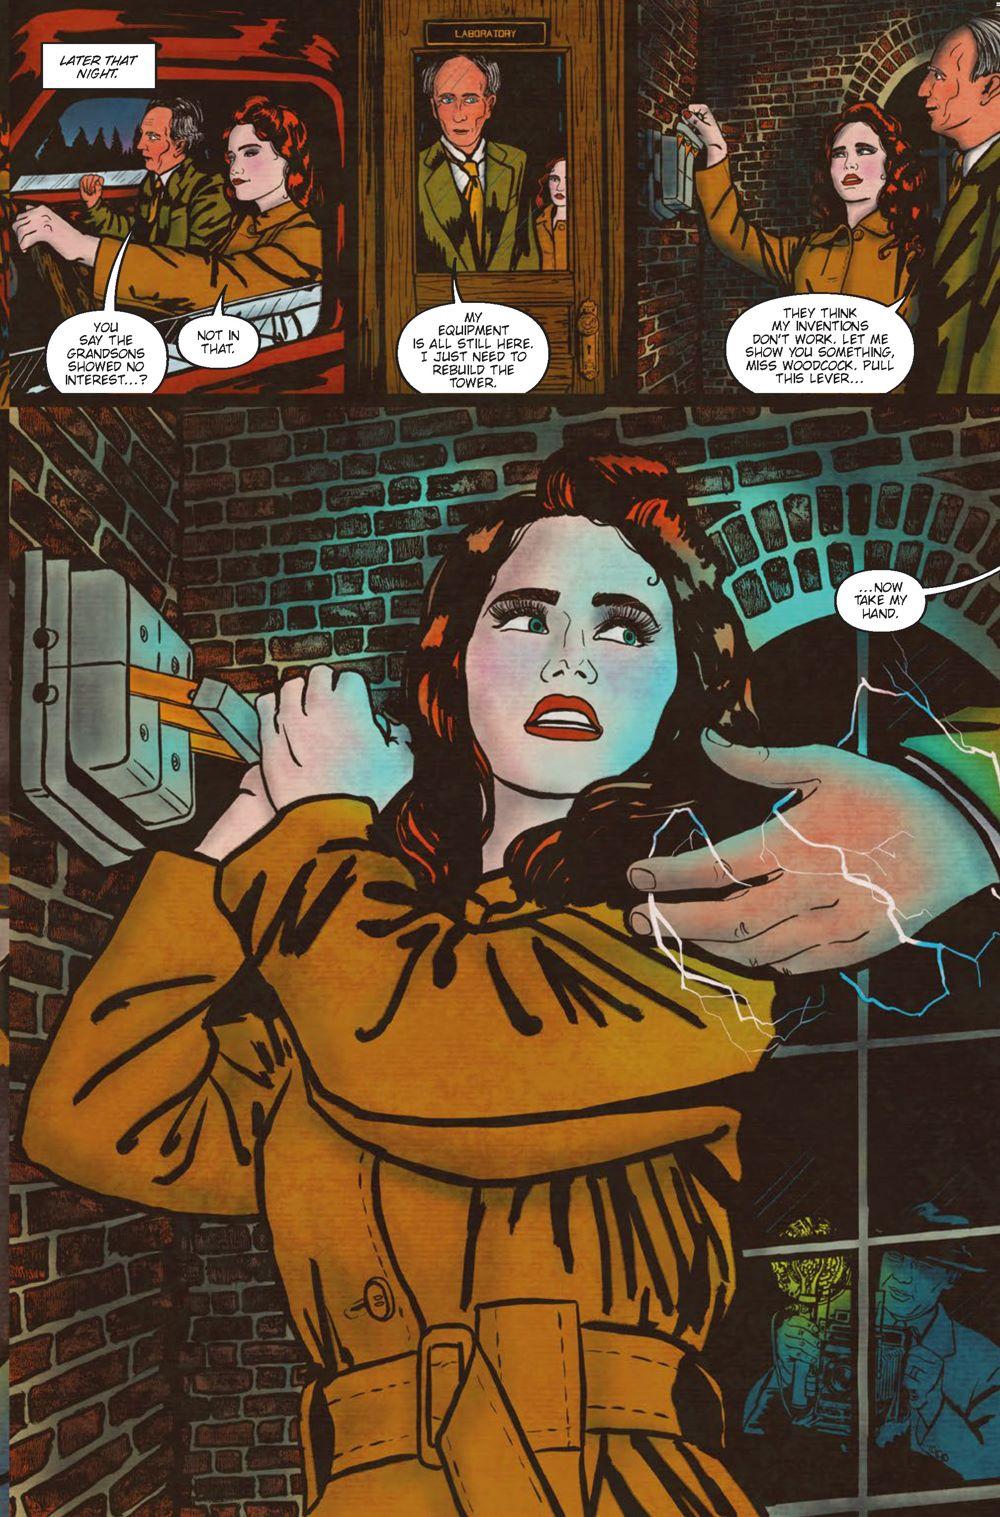 Minky-Interiors-Page_5 ComicList Previews: MINKY WOODCOCK THE GIRL WHO ELECTRIFIED TESLA #1